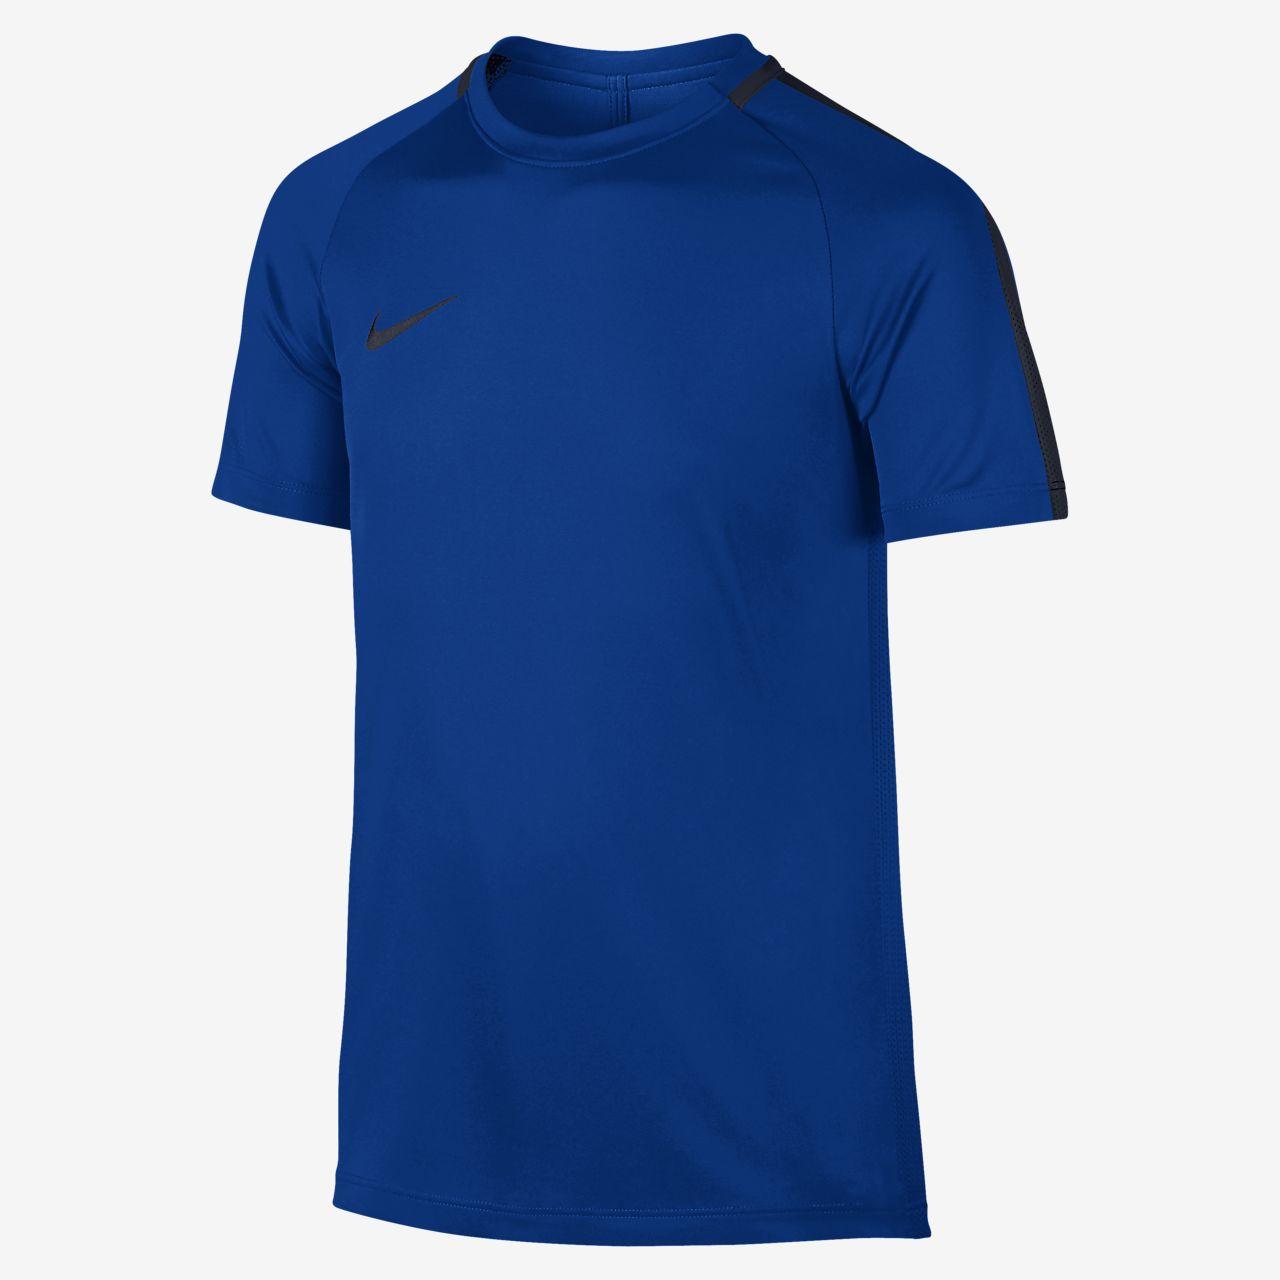 Nike Dri-FIT Academy Older Kids' Football Top